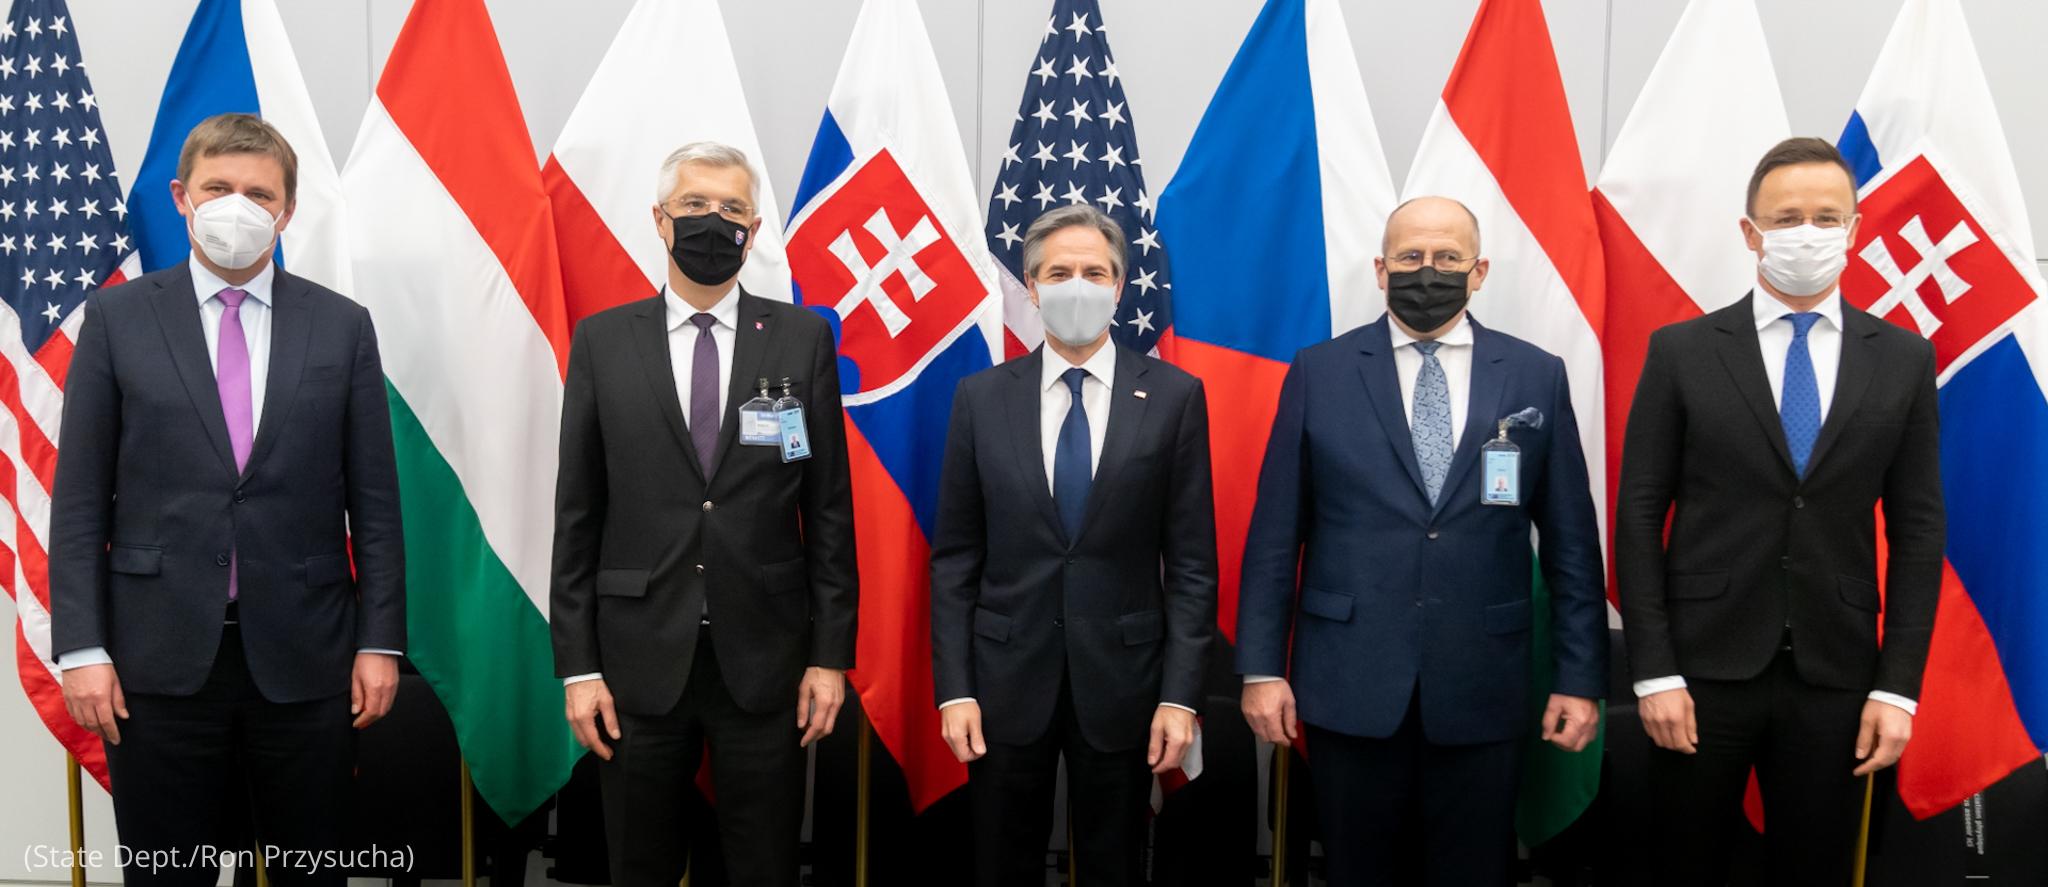 Antony J. Blinken standing with group of men in suits (State Dept./Ron Przysucha)